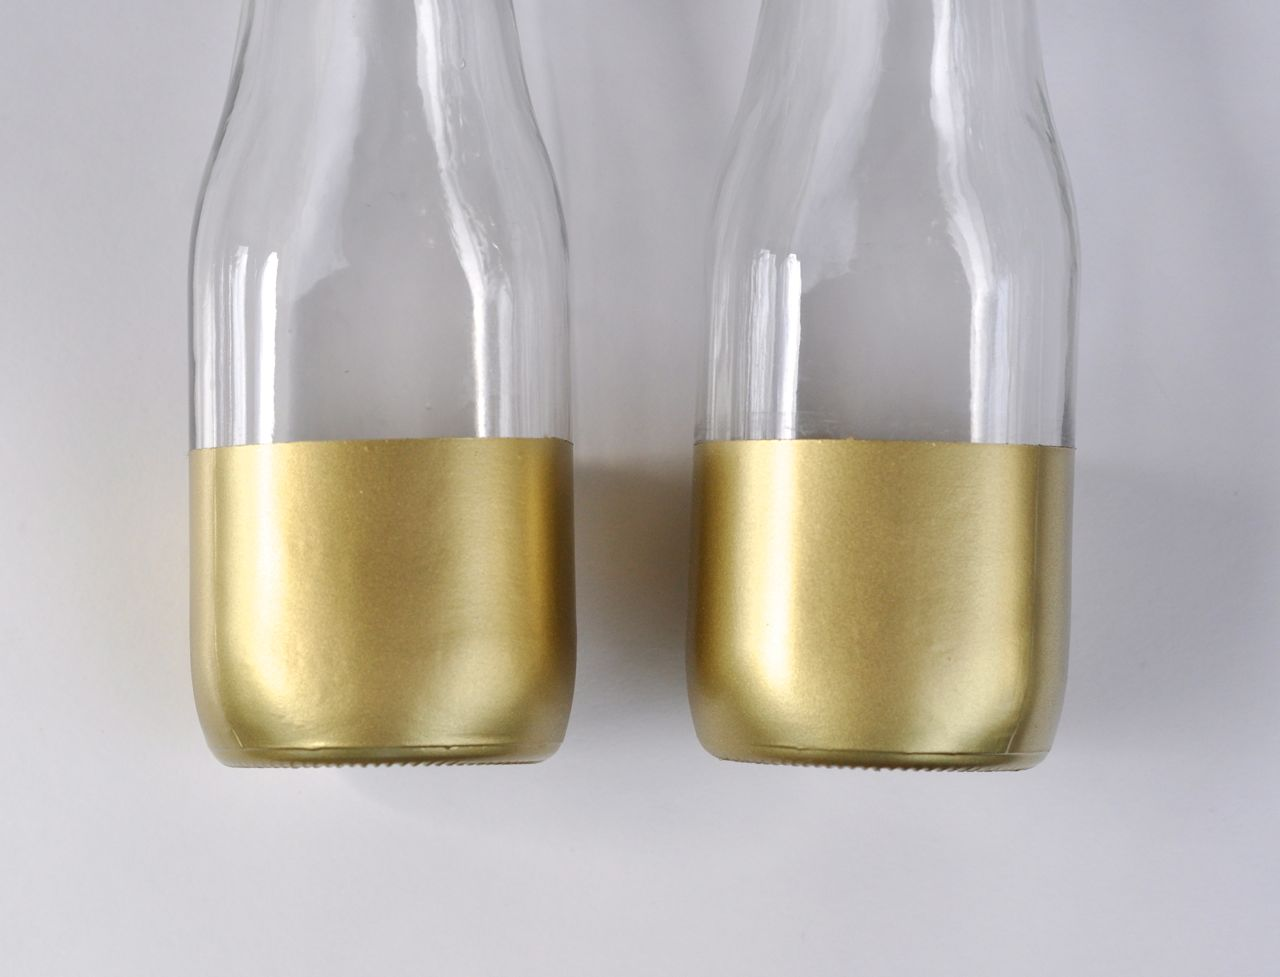 Diy gold dipped vases giveaway make life lovely diy gold dipped vase diy gold dipped vase reviewsmspy